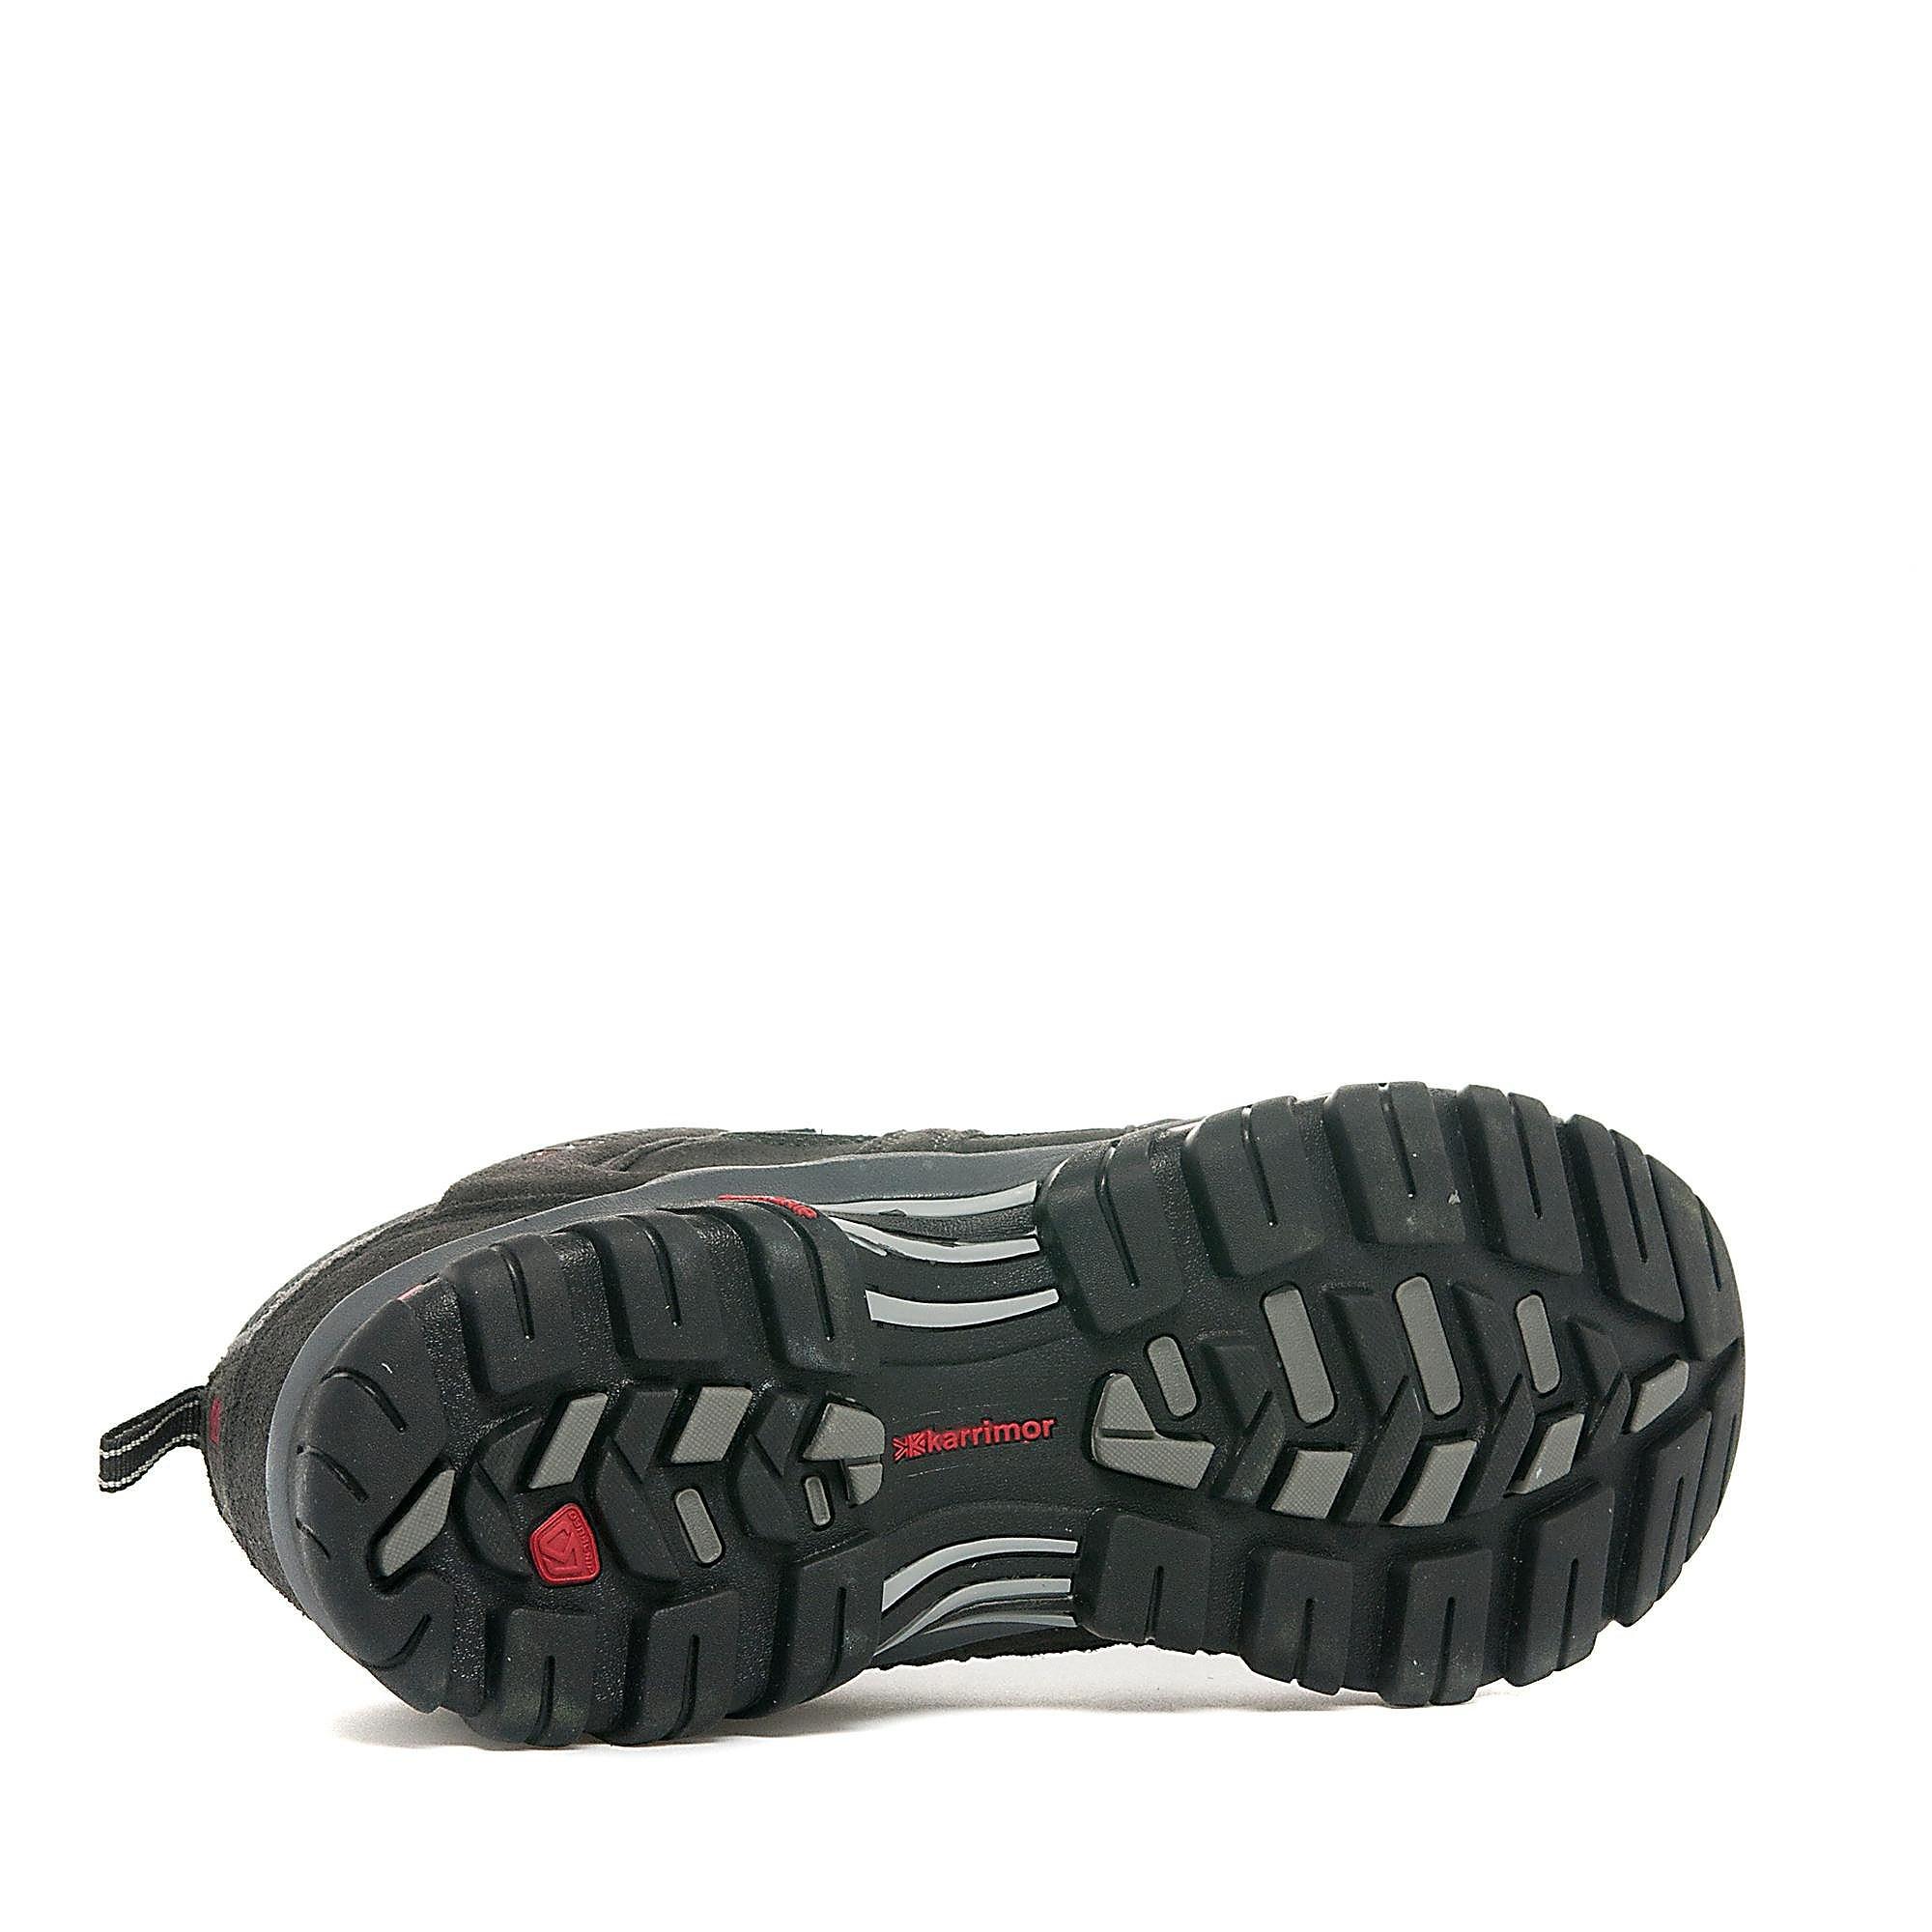 Karrimor Bodmin IV Low Walking Shoe